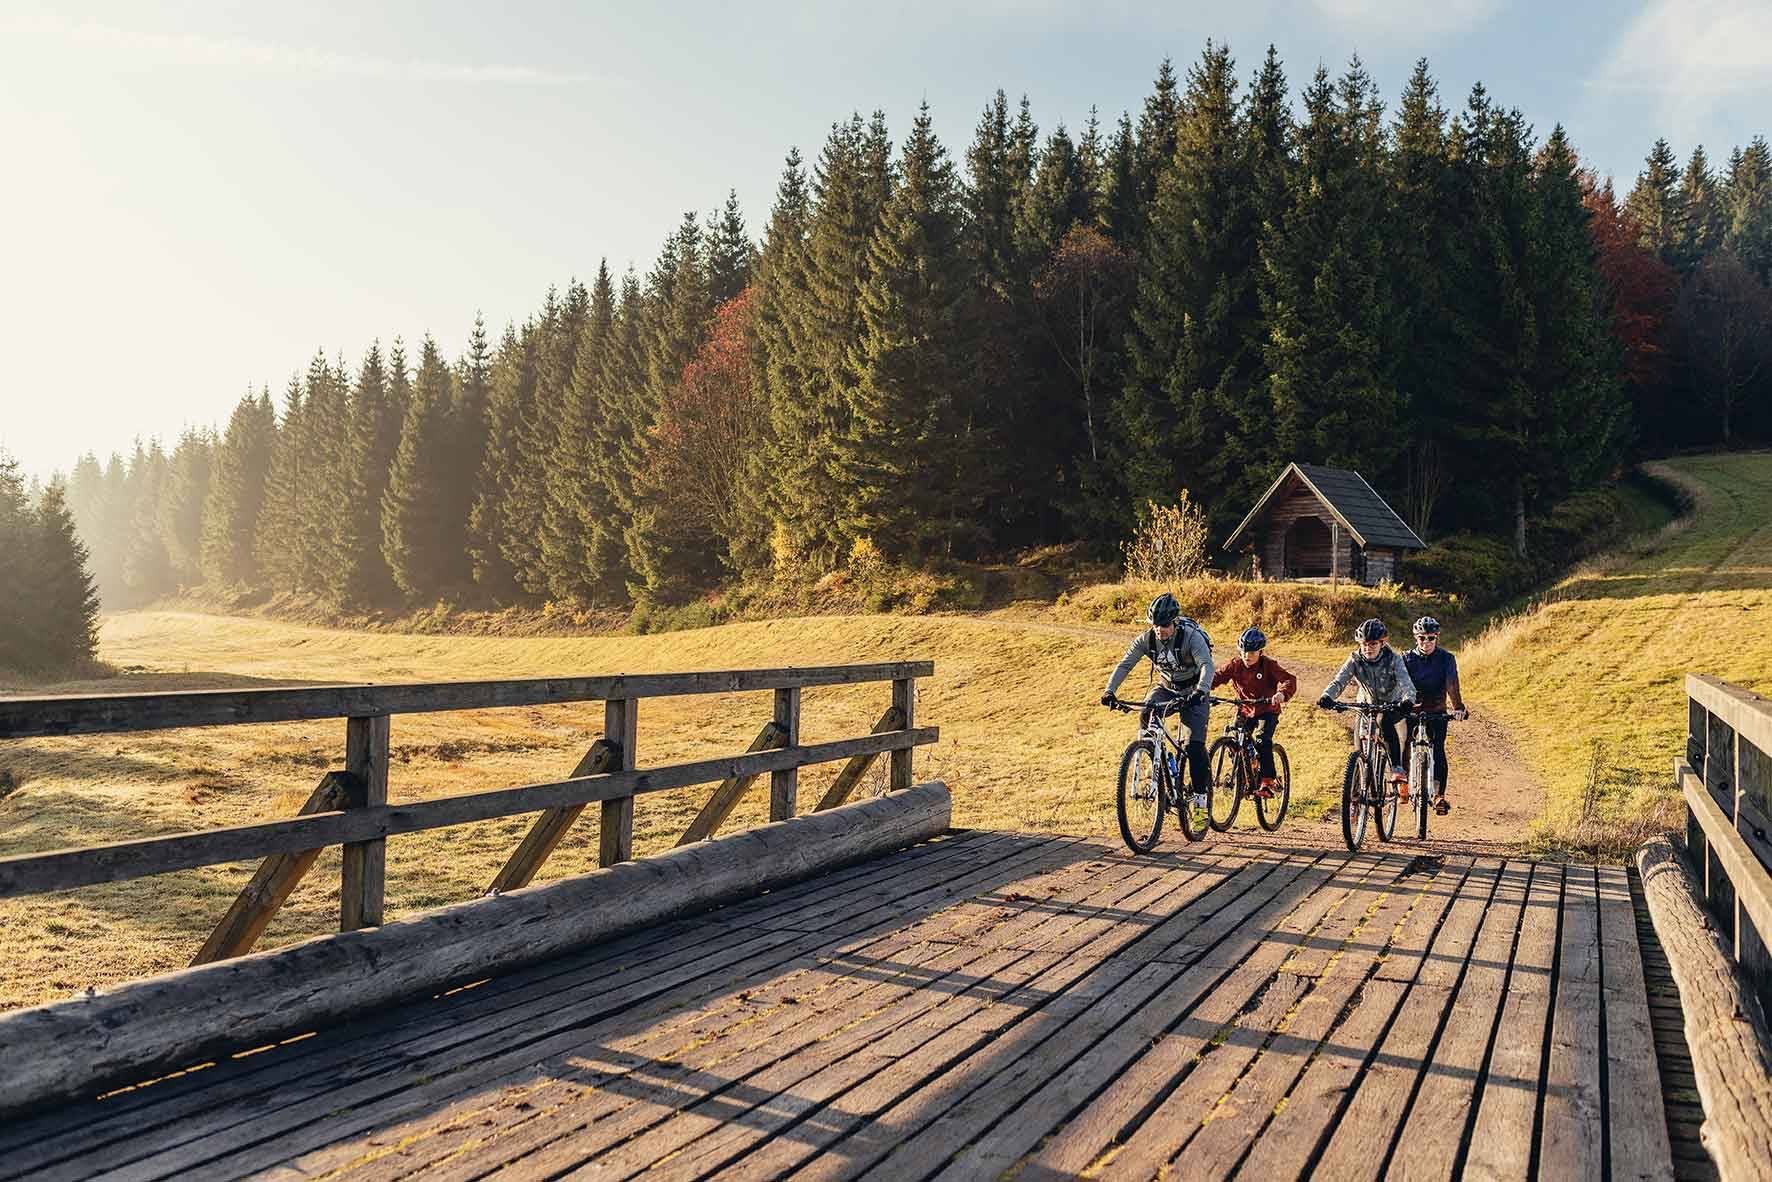 Fahrradfahrer in Berglandschaft